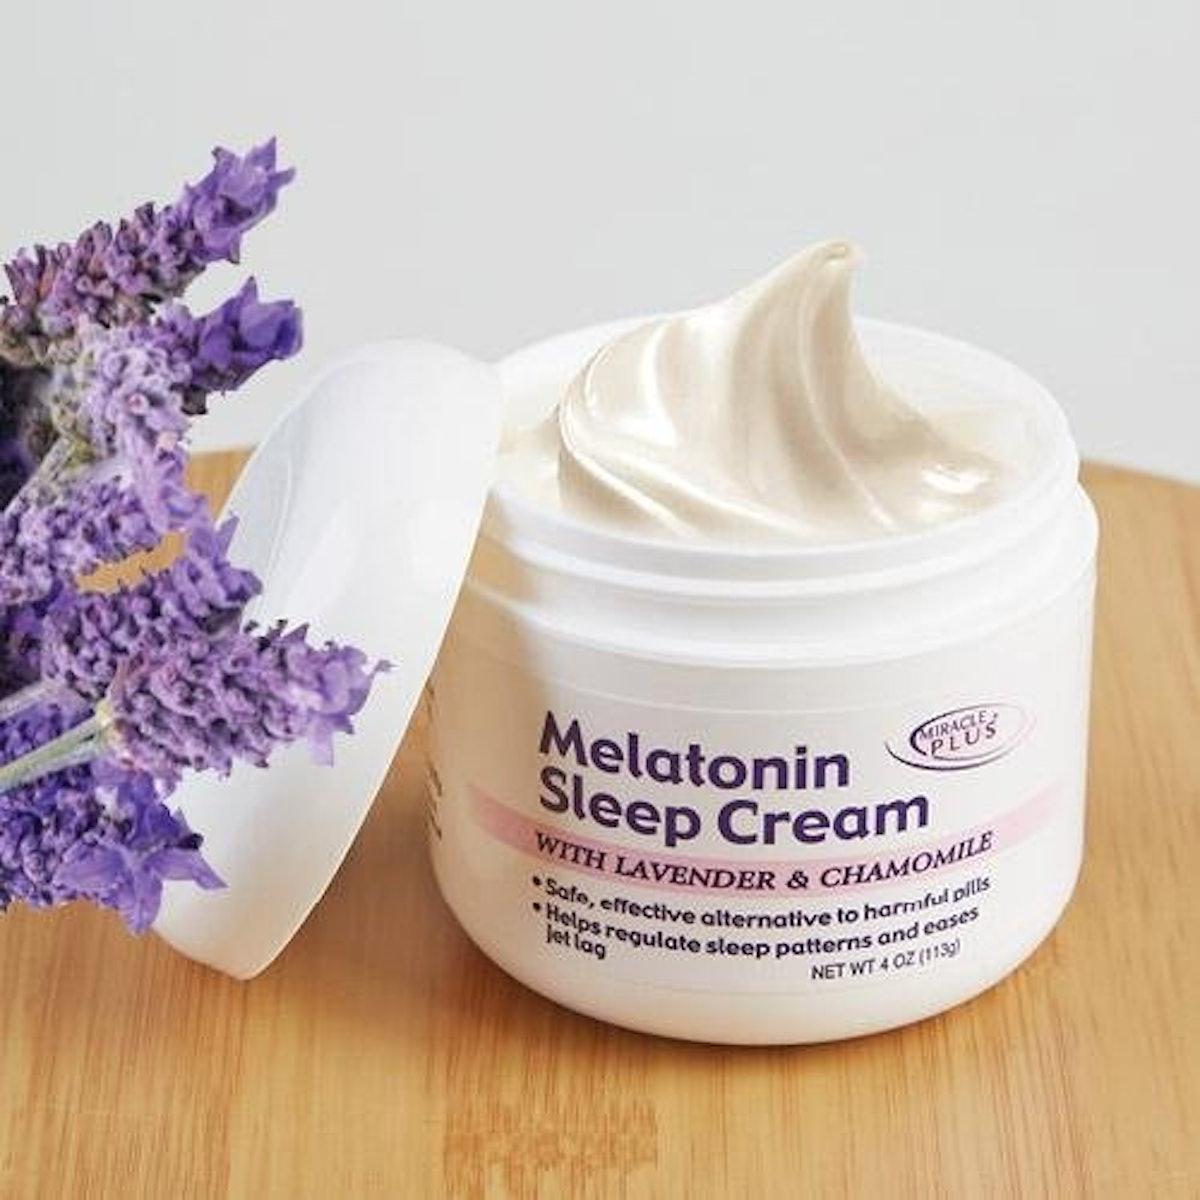 Melatonin Sleep Night Cream With Lavendar & Chamomile (4oz)